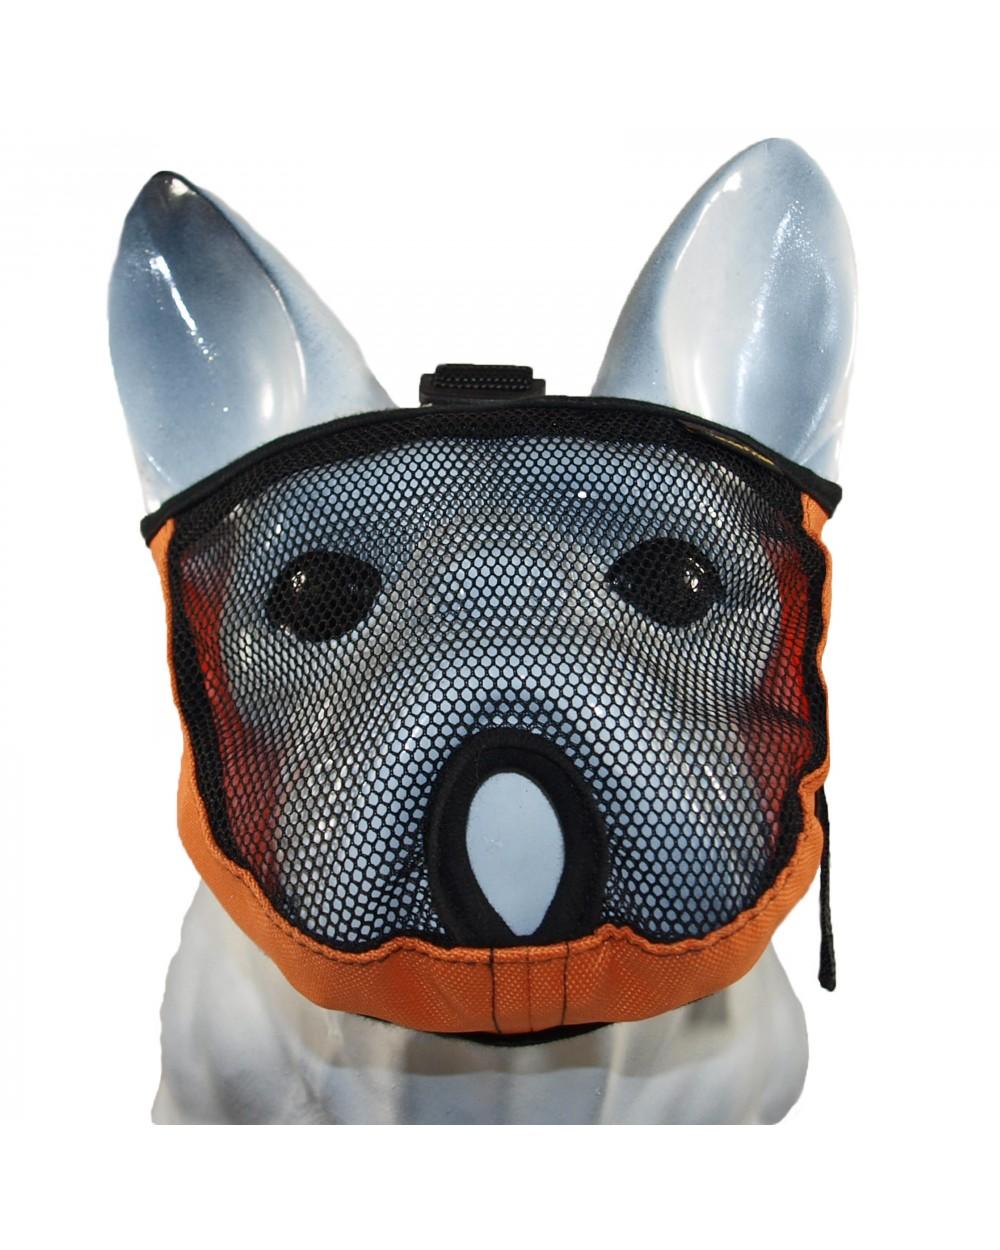 kagańce dla psów